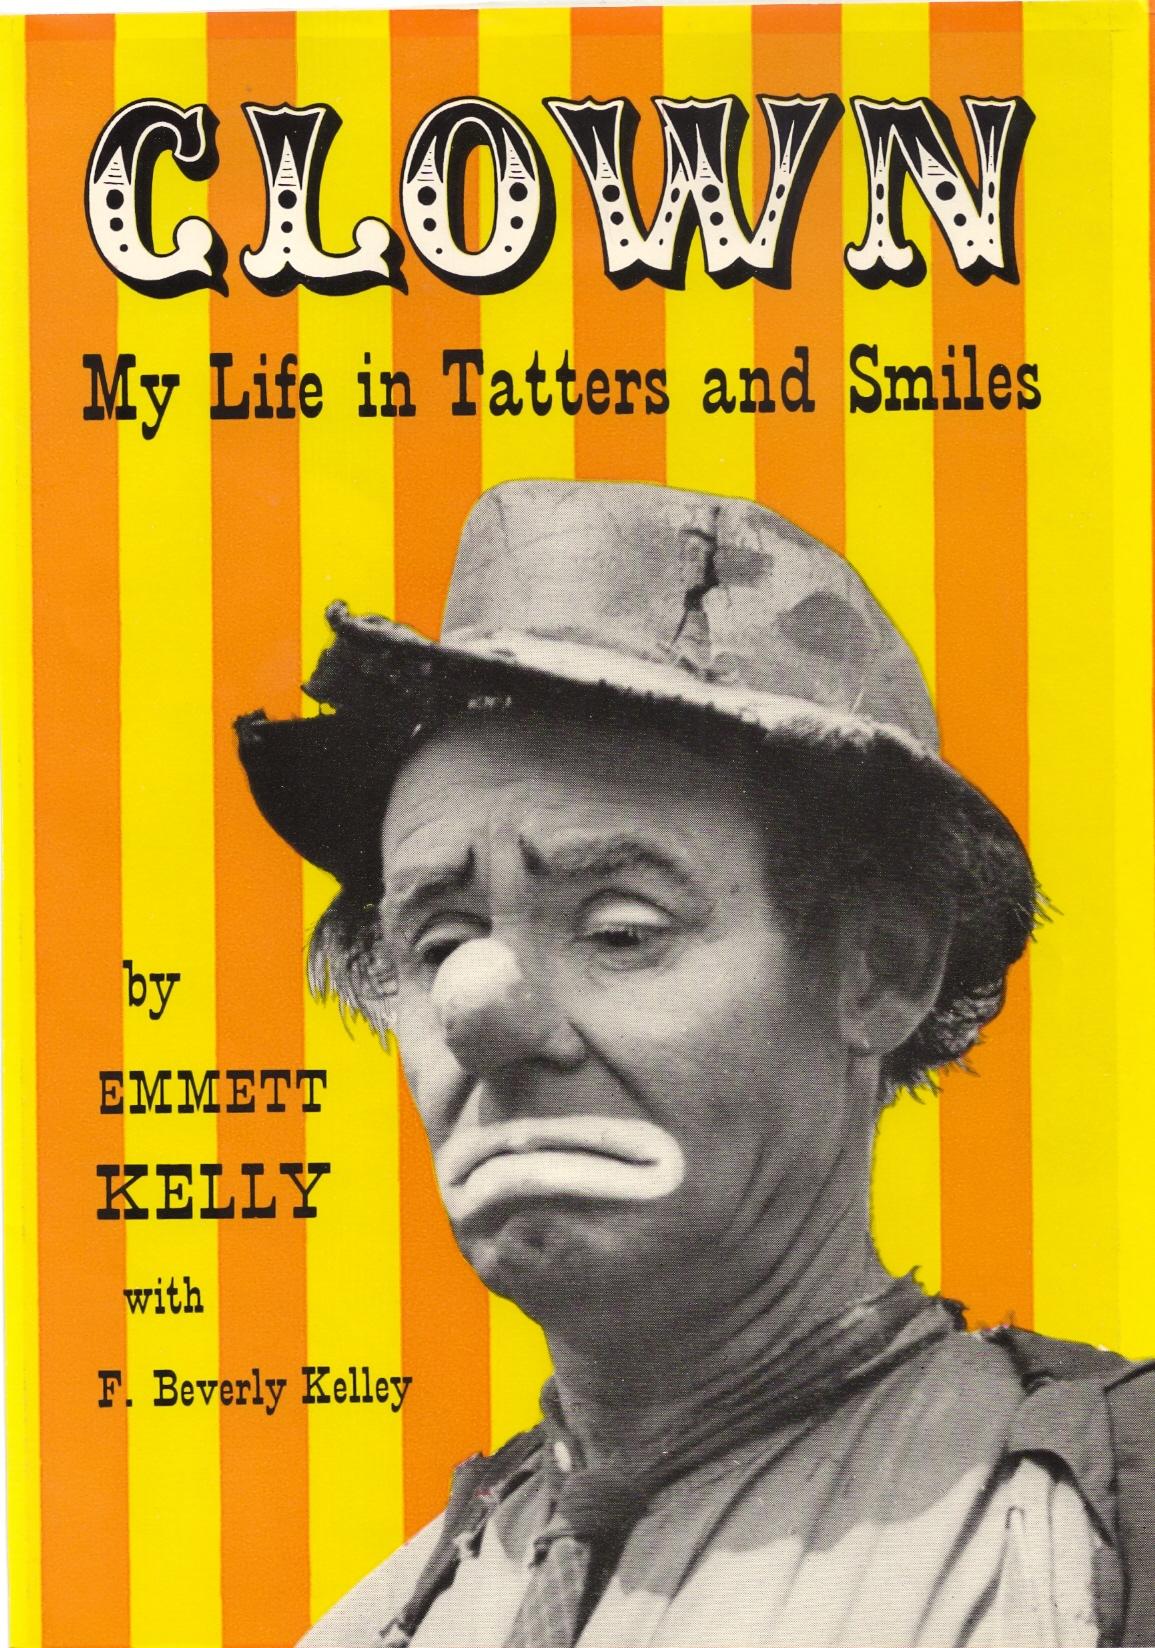 Clown book cover